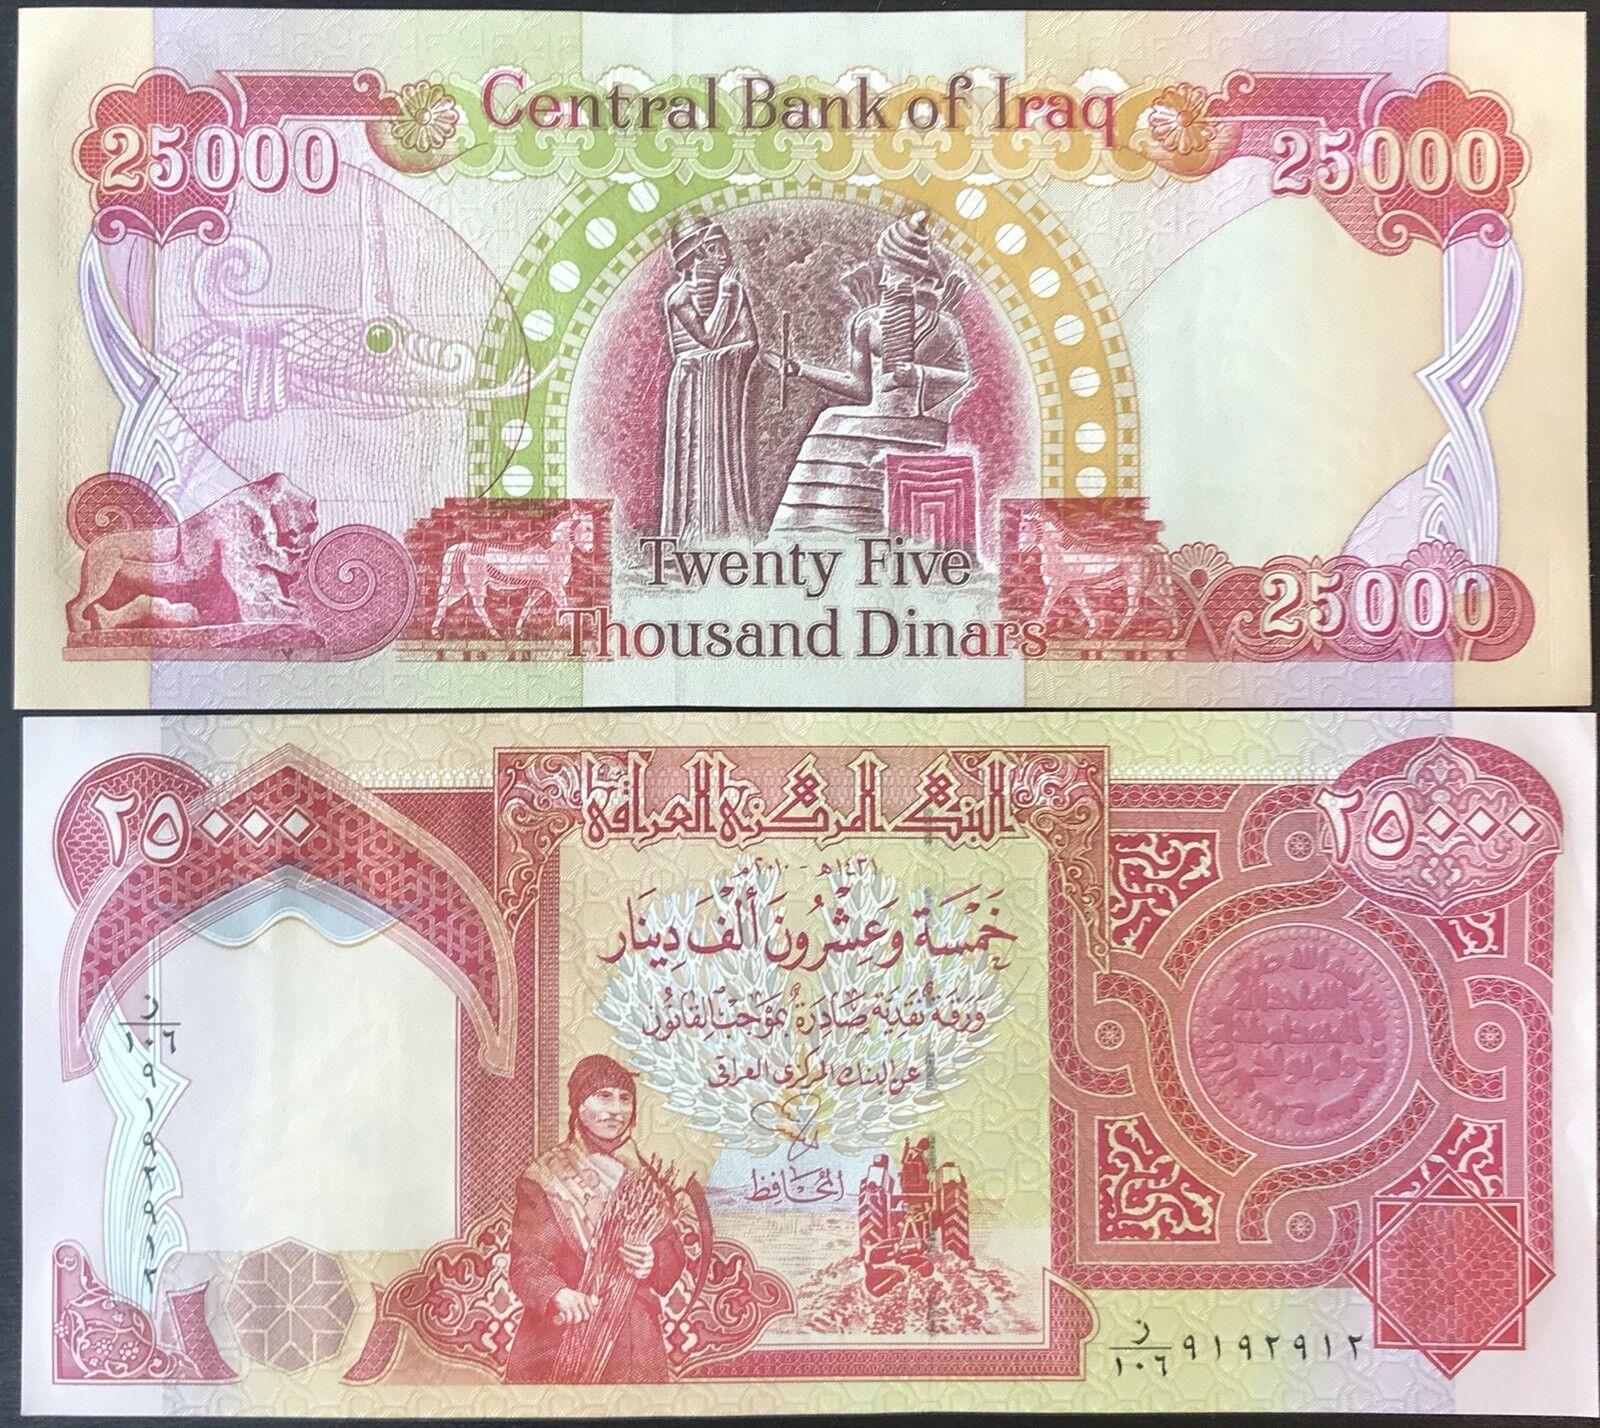 25 000 Of Iraqi Dinar Money 1 X 25000